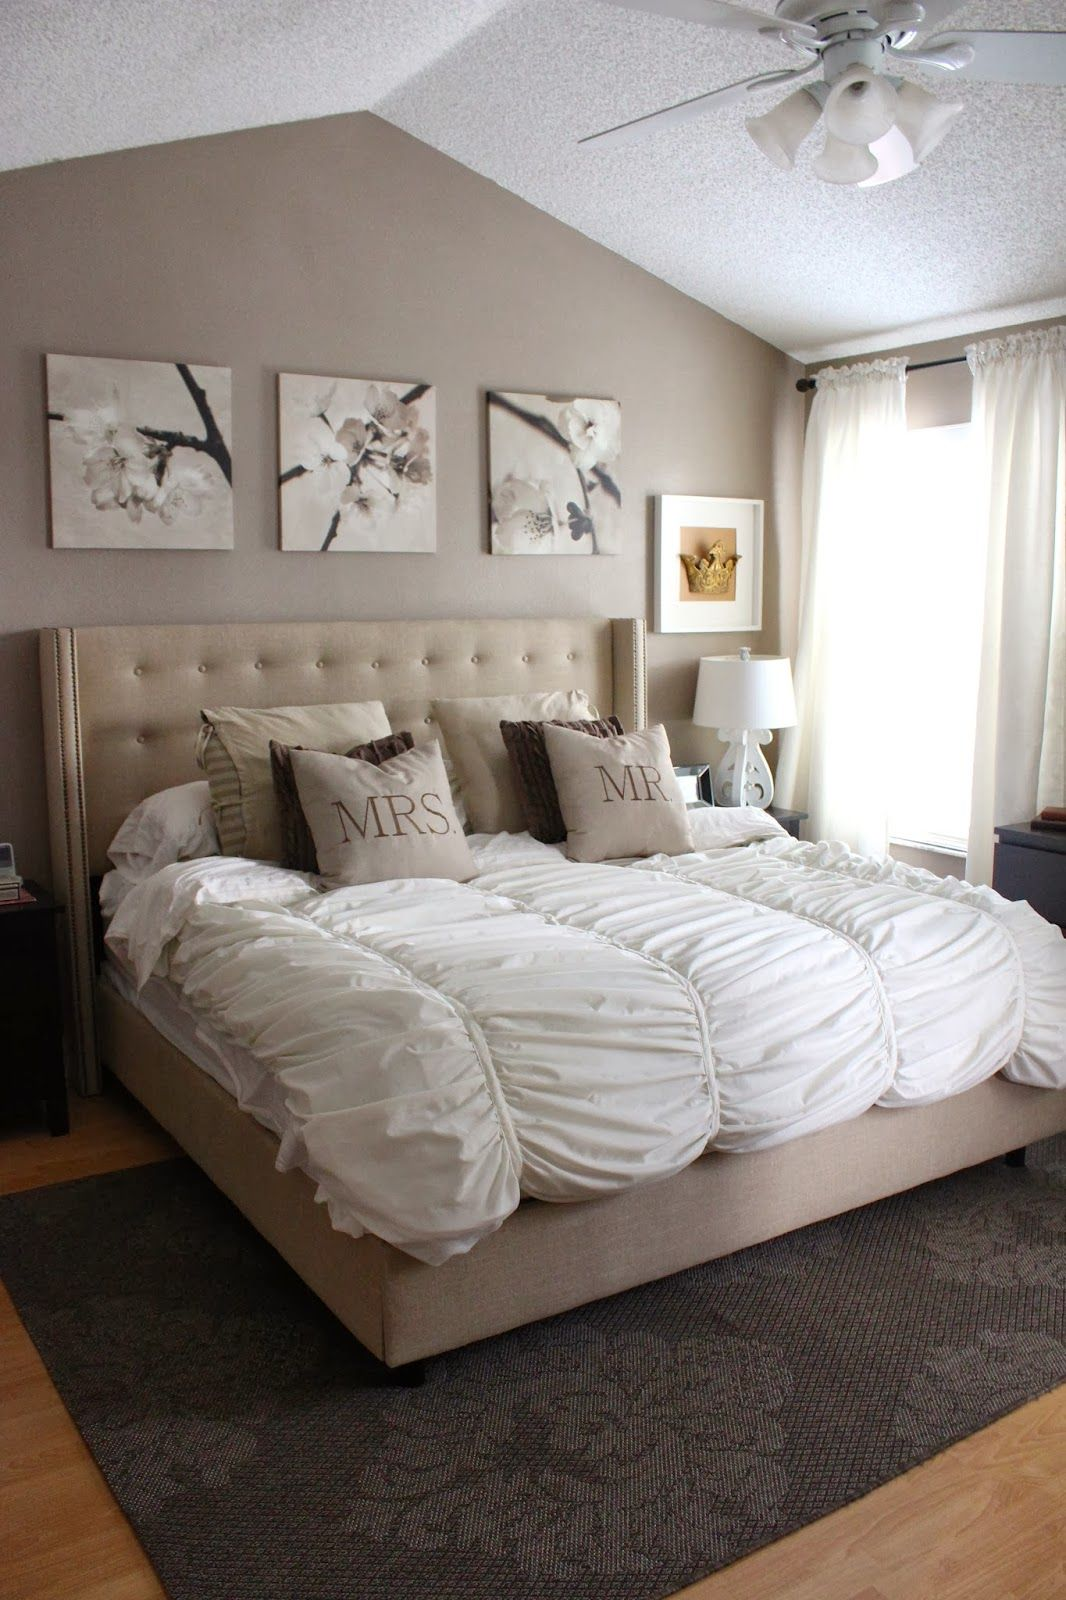 Home Tour Master Bedrooms Decor Bedroom Makeover Home Bedroom